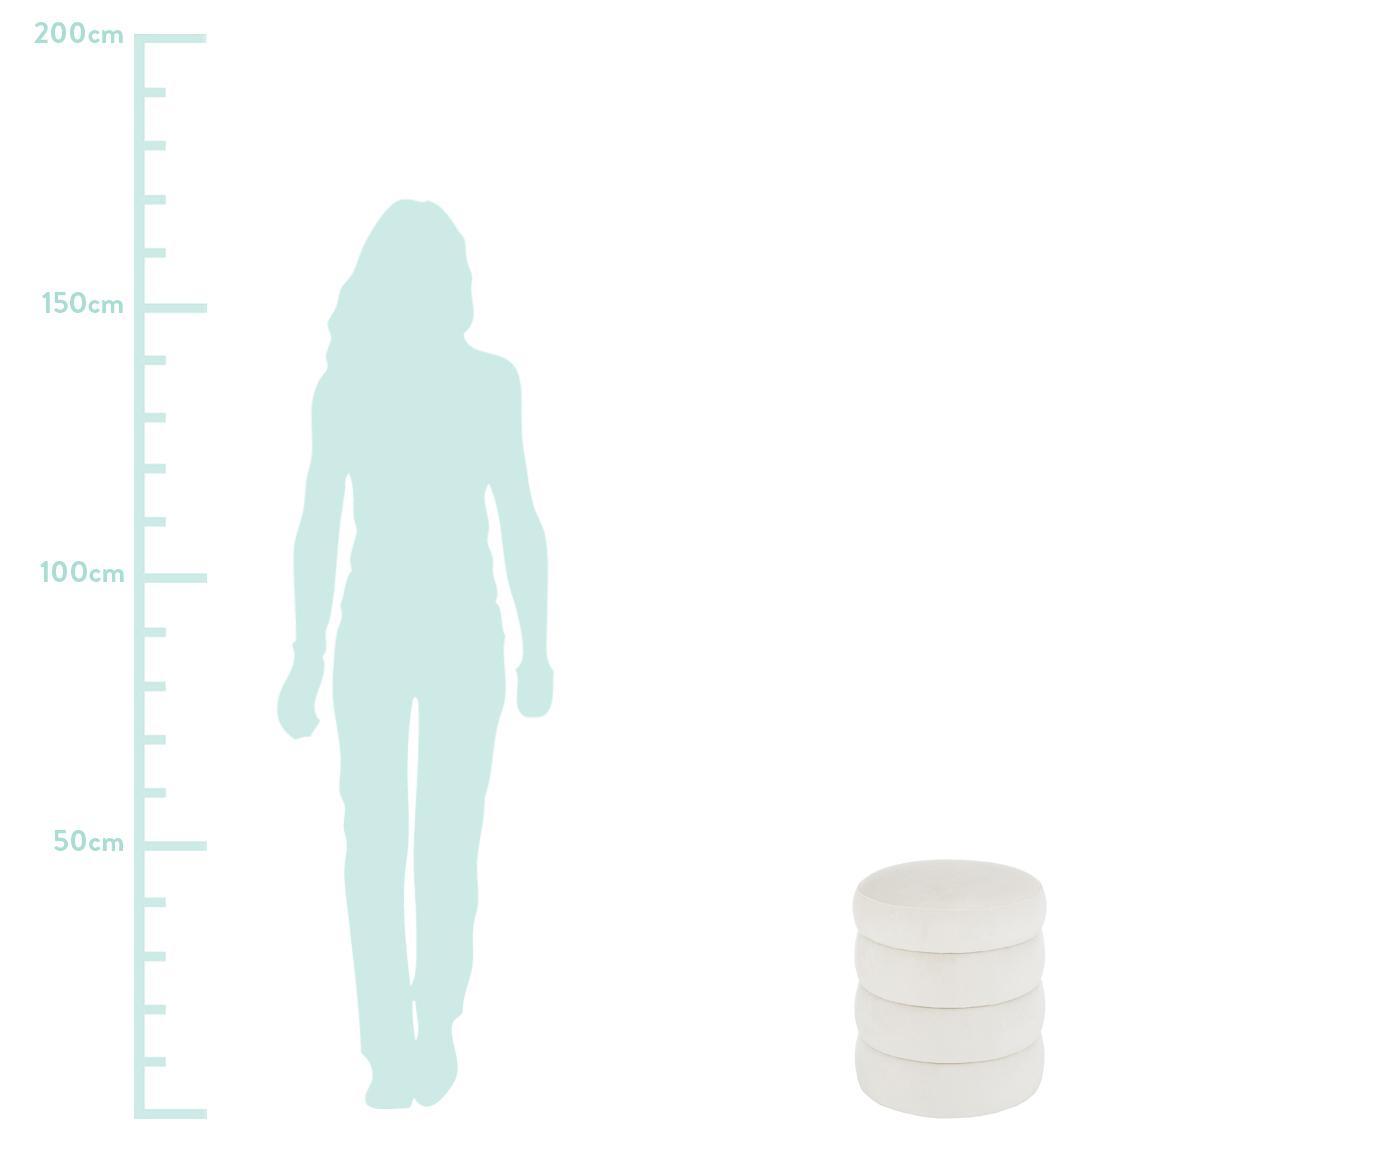 Fluwelen poef Alto, Bekleding: fluweel (polyester), Frame: massief grenenhout, multi, Crèmewit, Ø 42 x H 48 cm